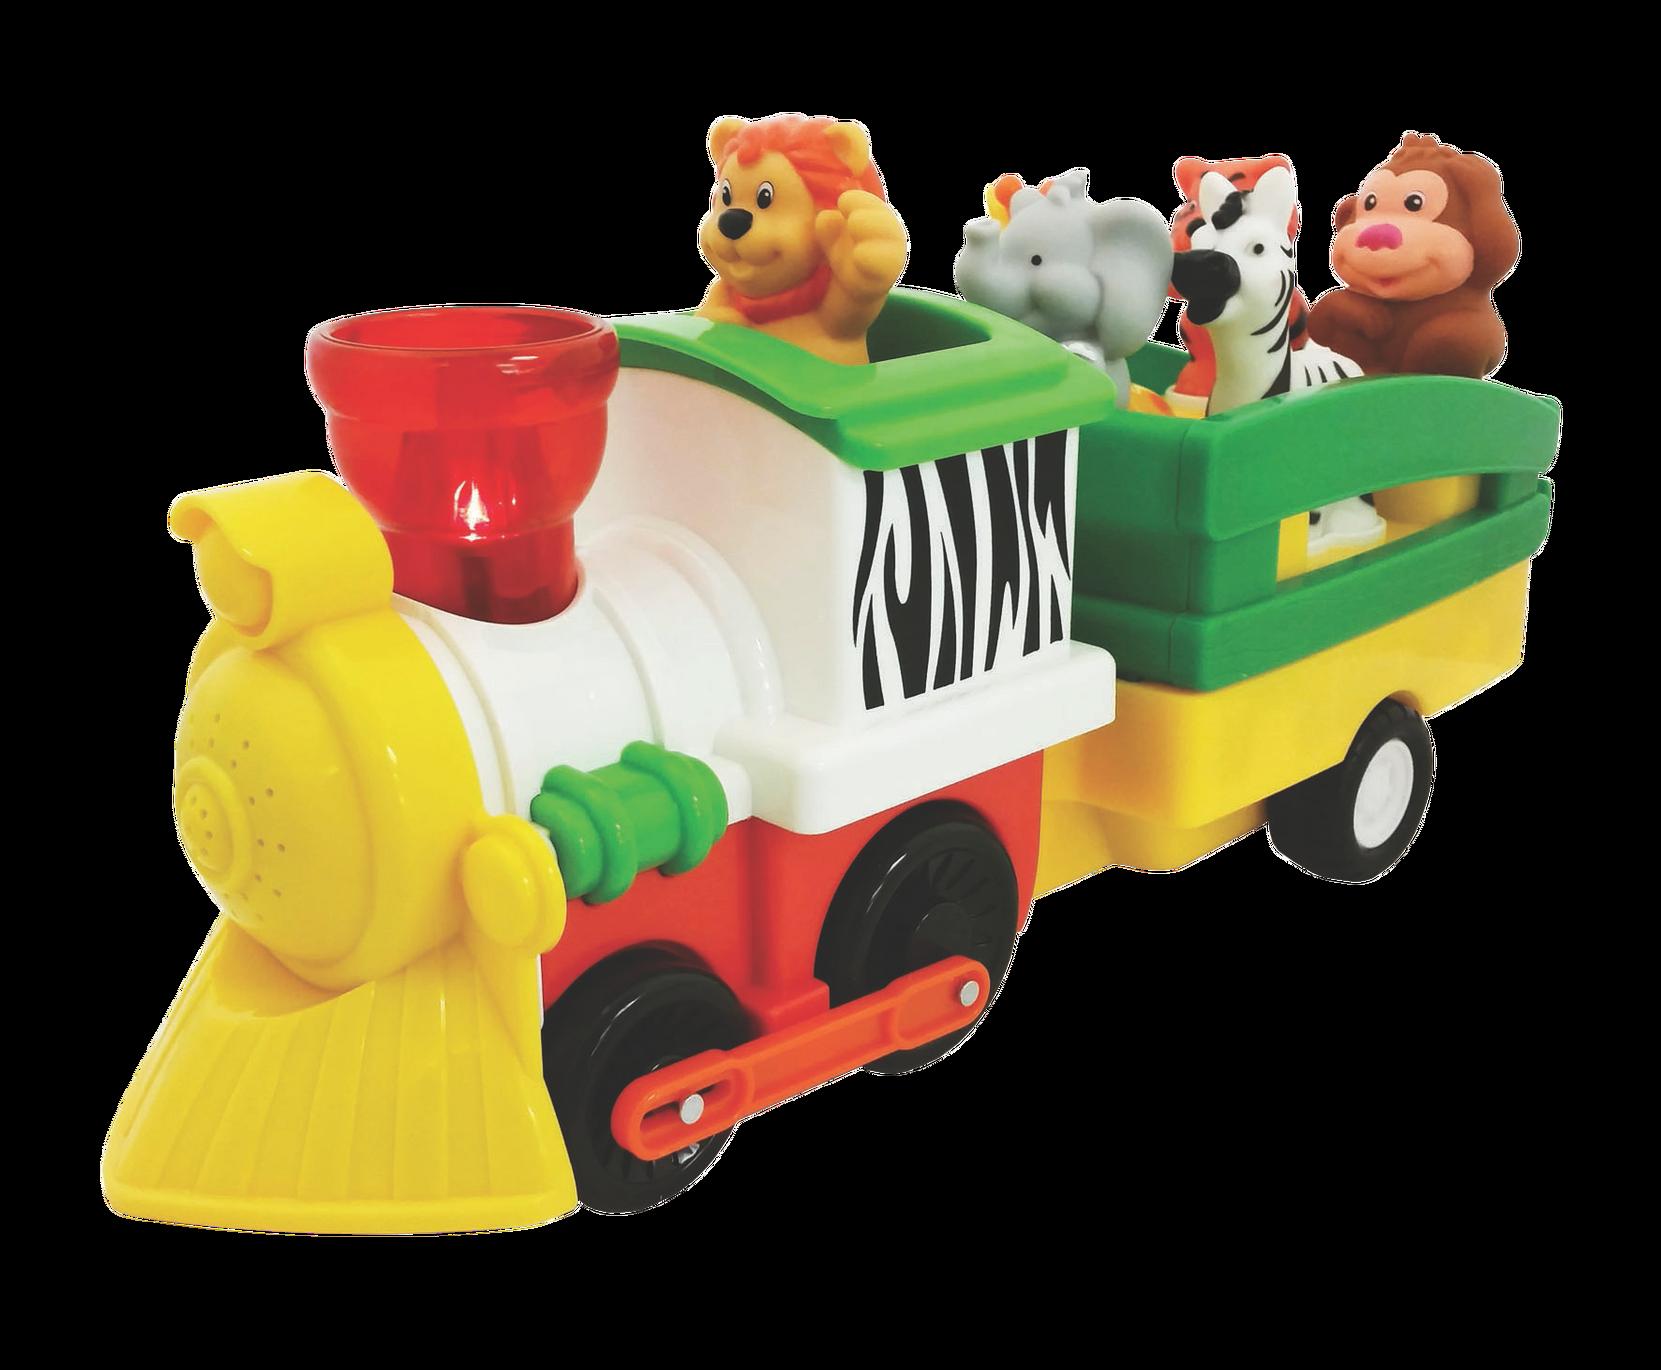 Juna ja eläimet